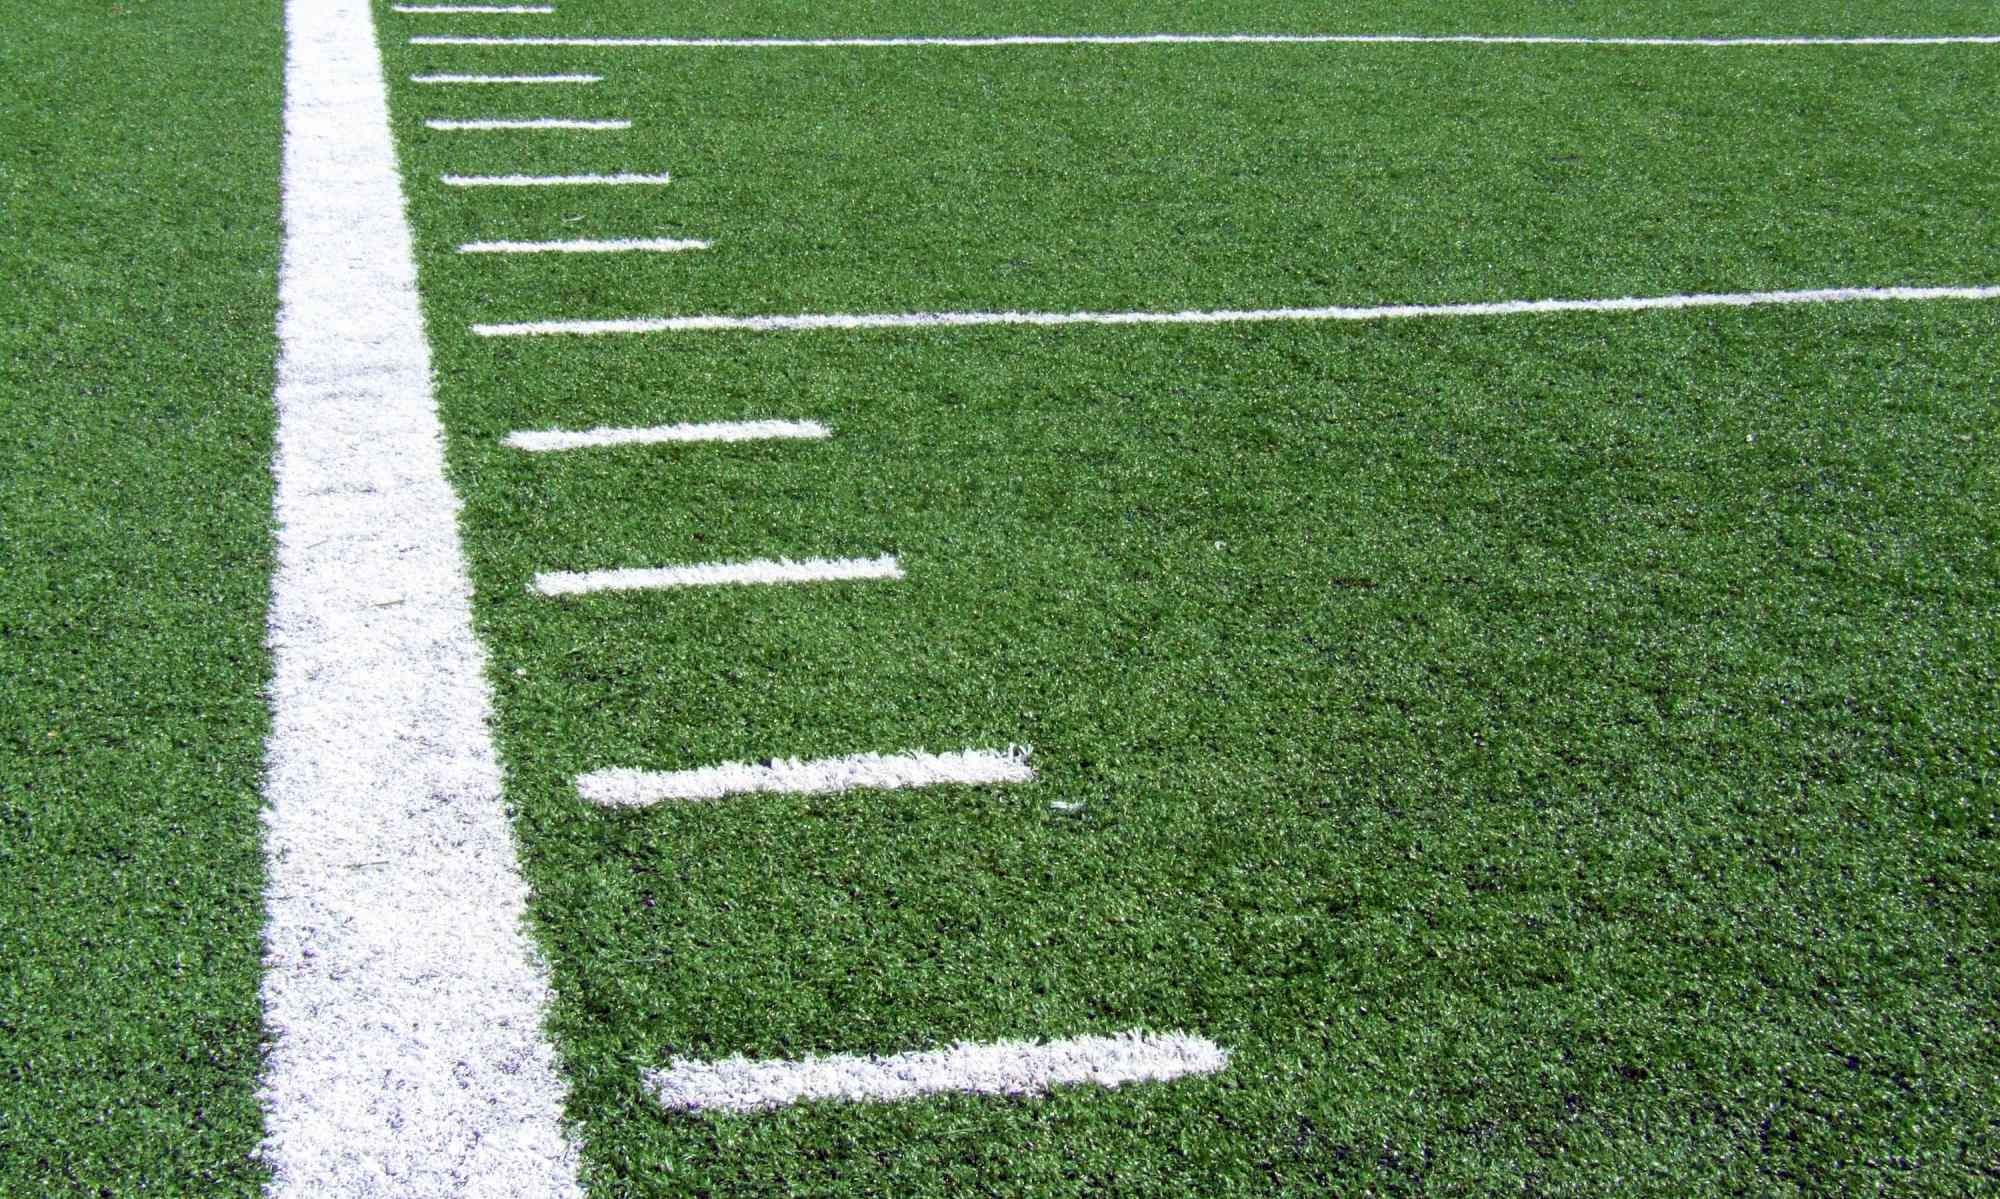 Sports Line Analytics